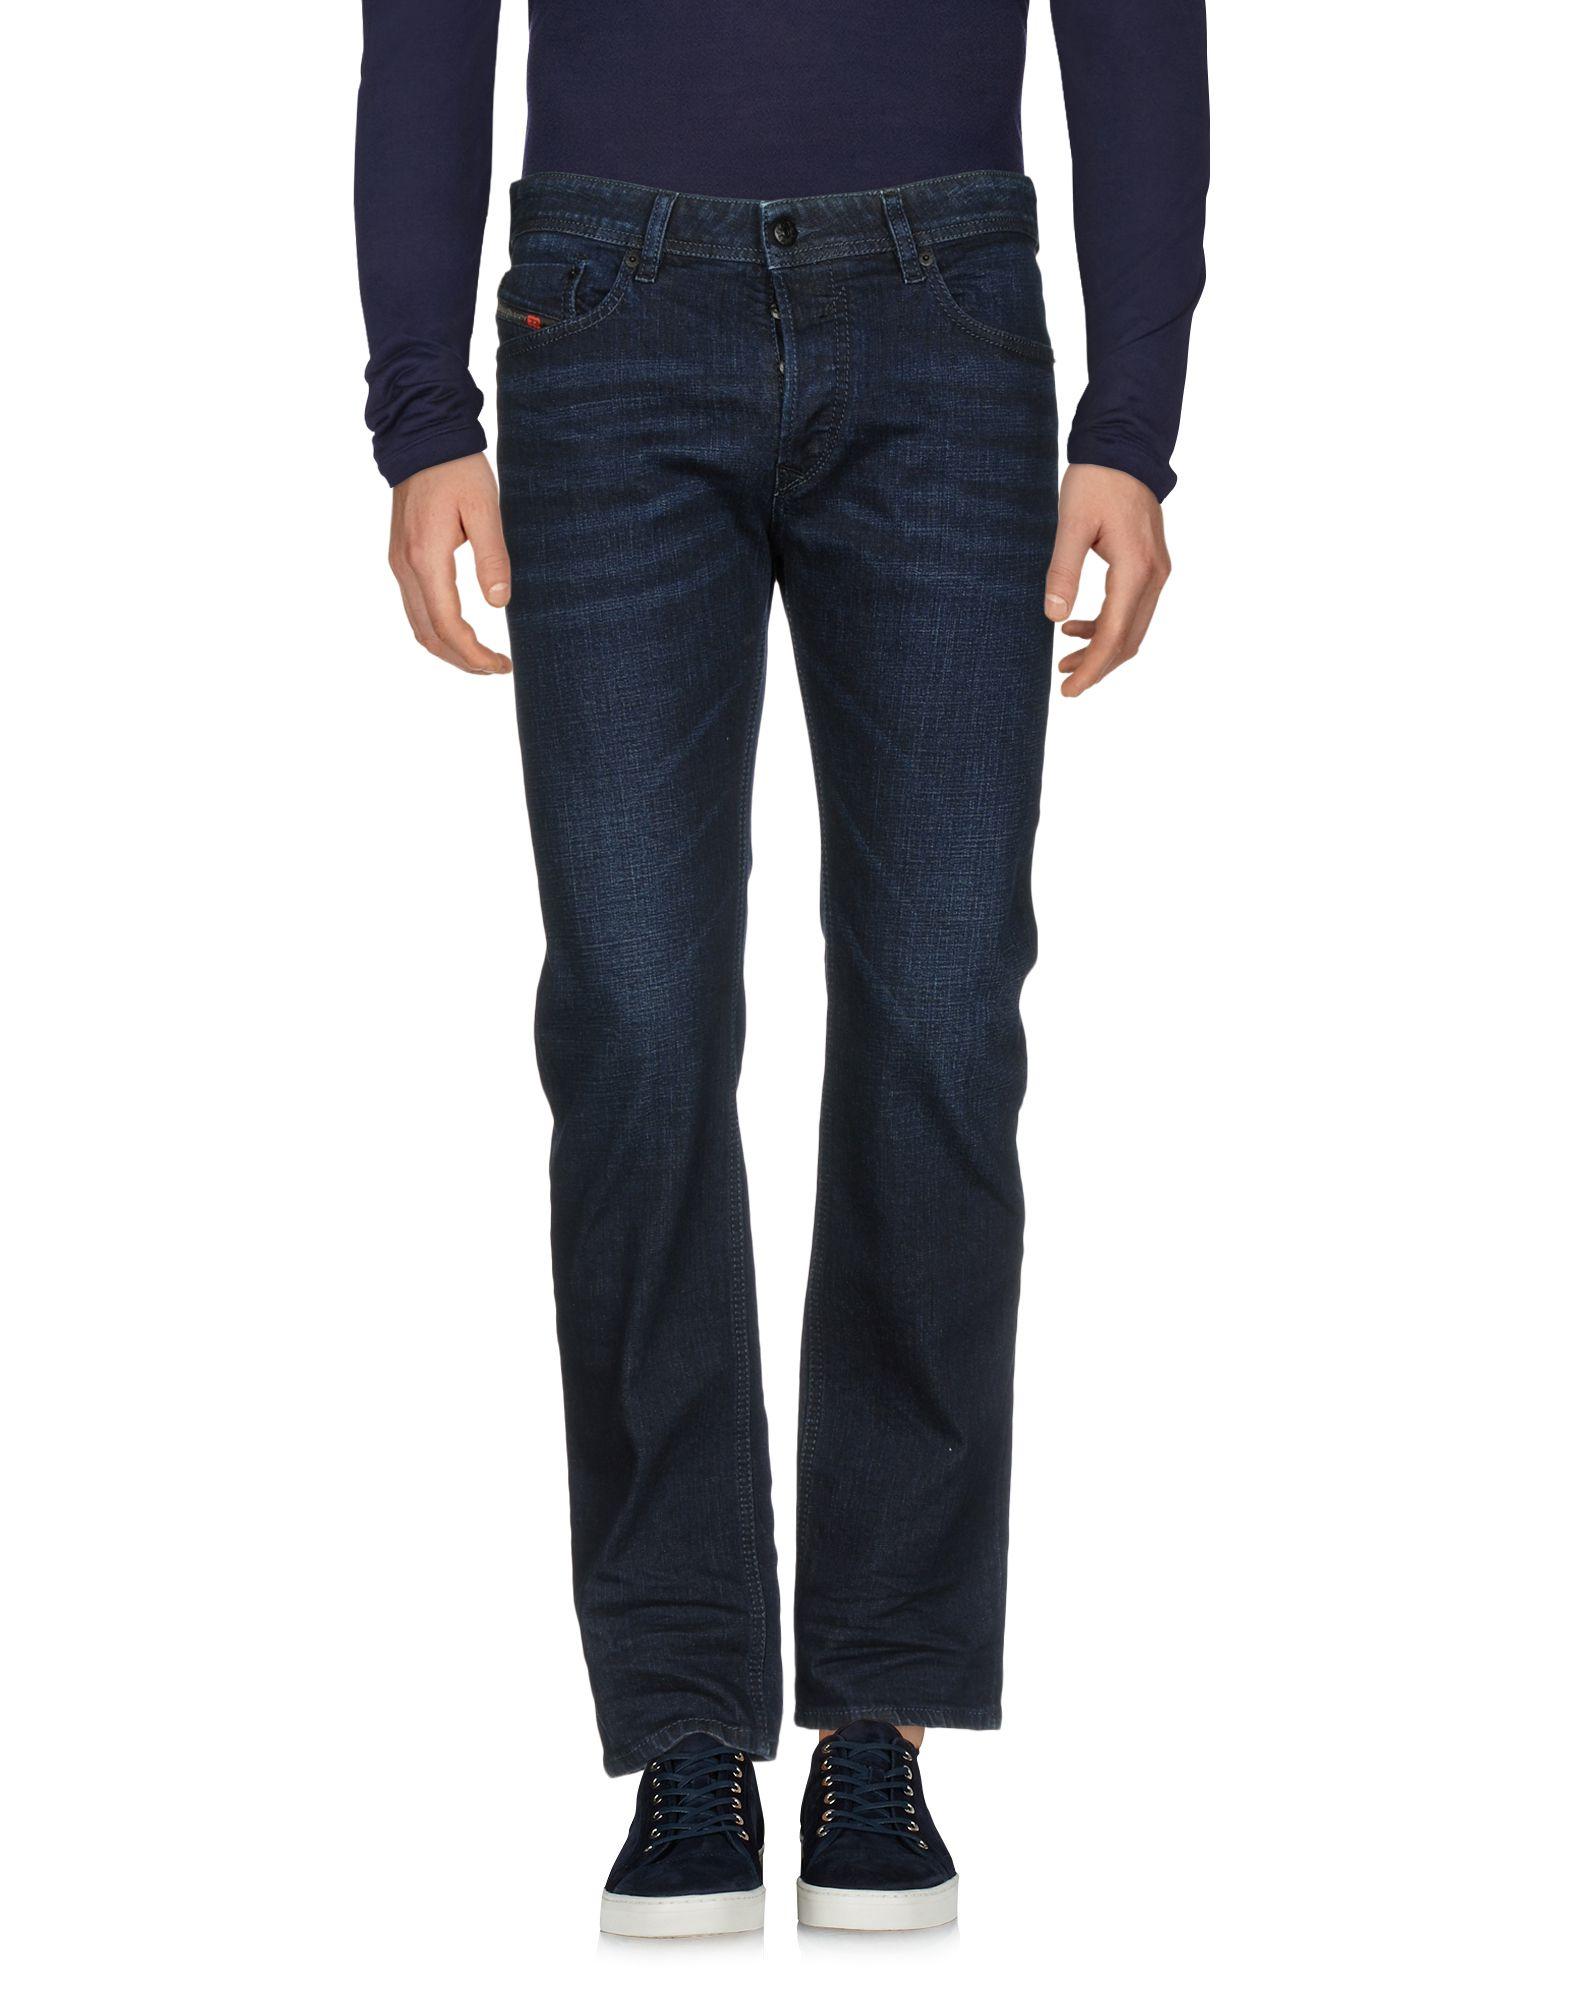 Pantaloni Jeans Uomo Diesel Uomo Jeans - 42672521PV 656efd